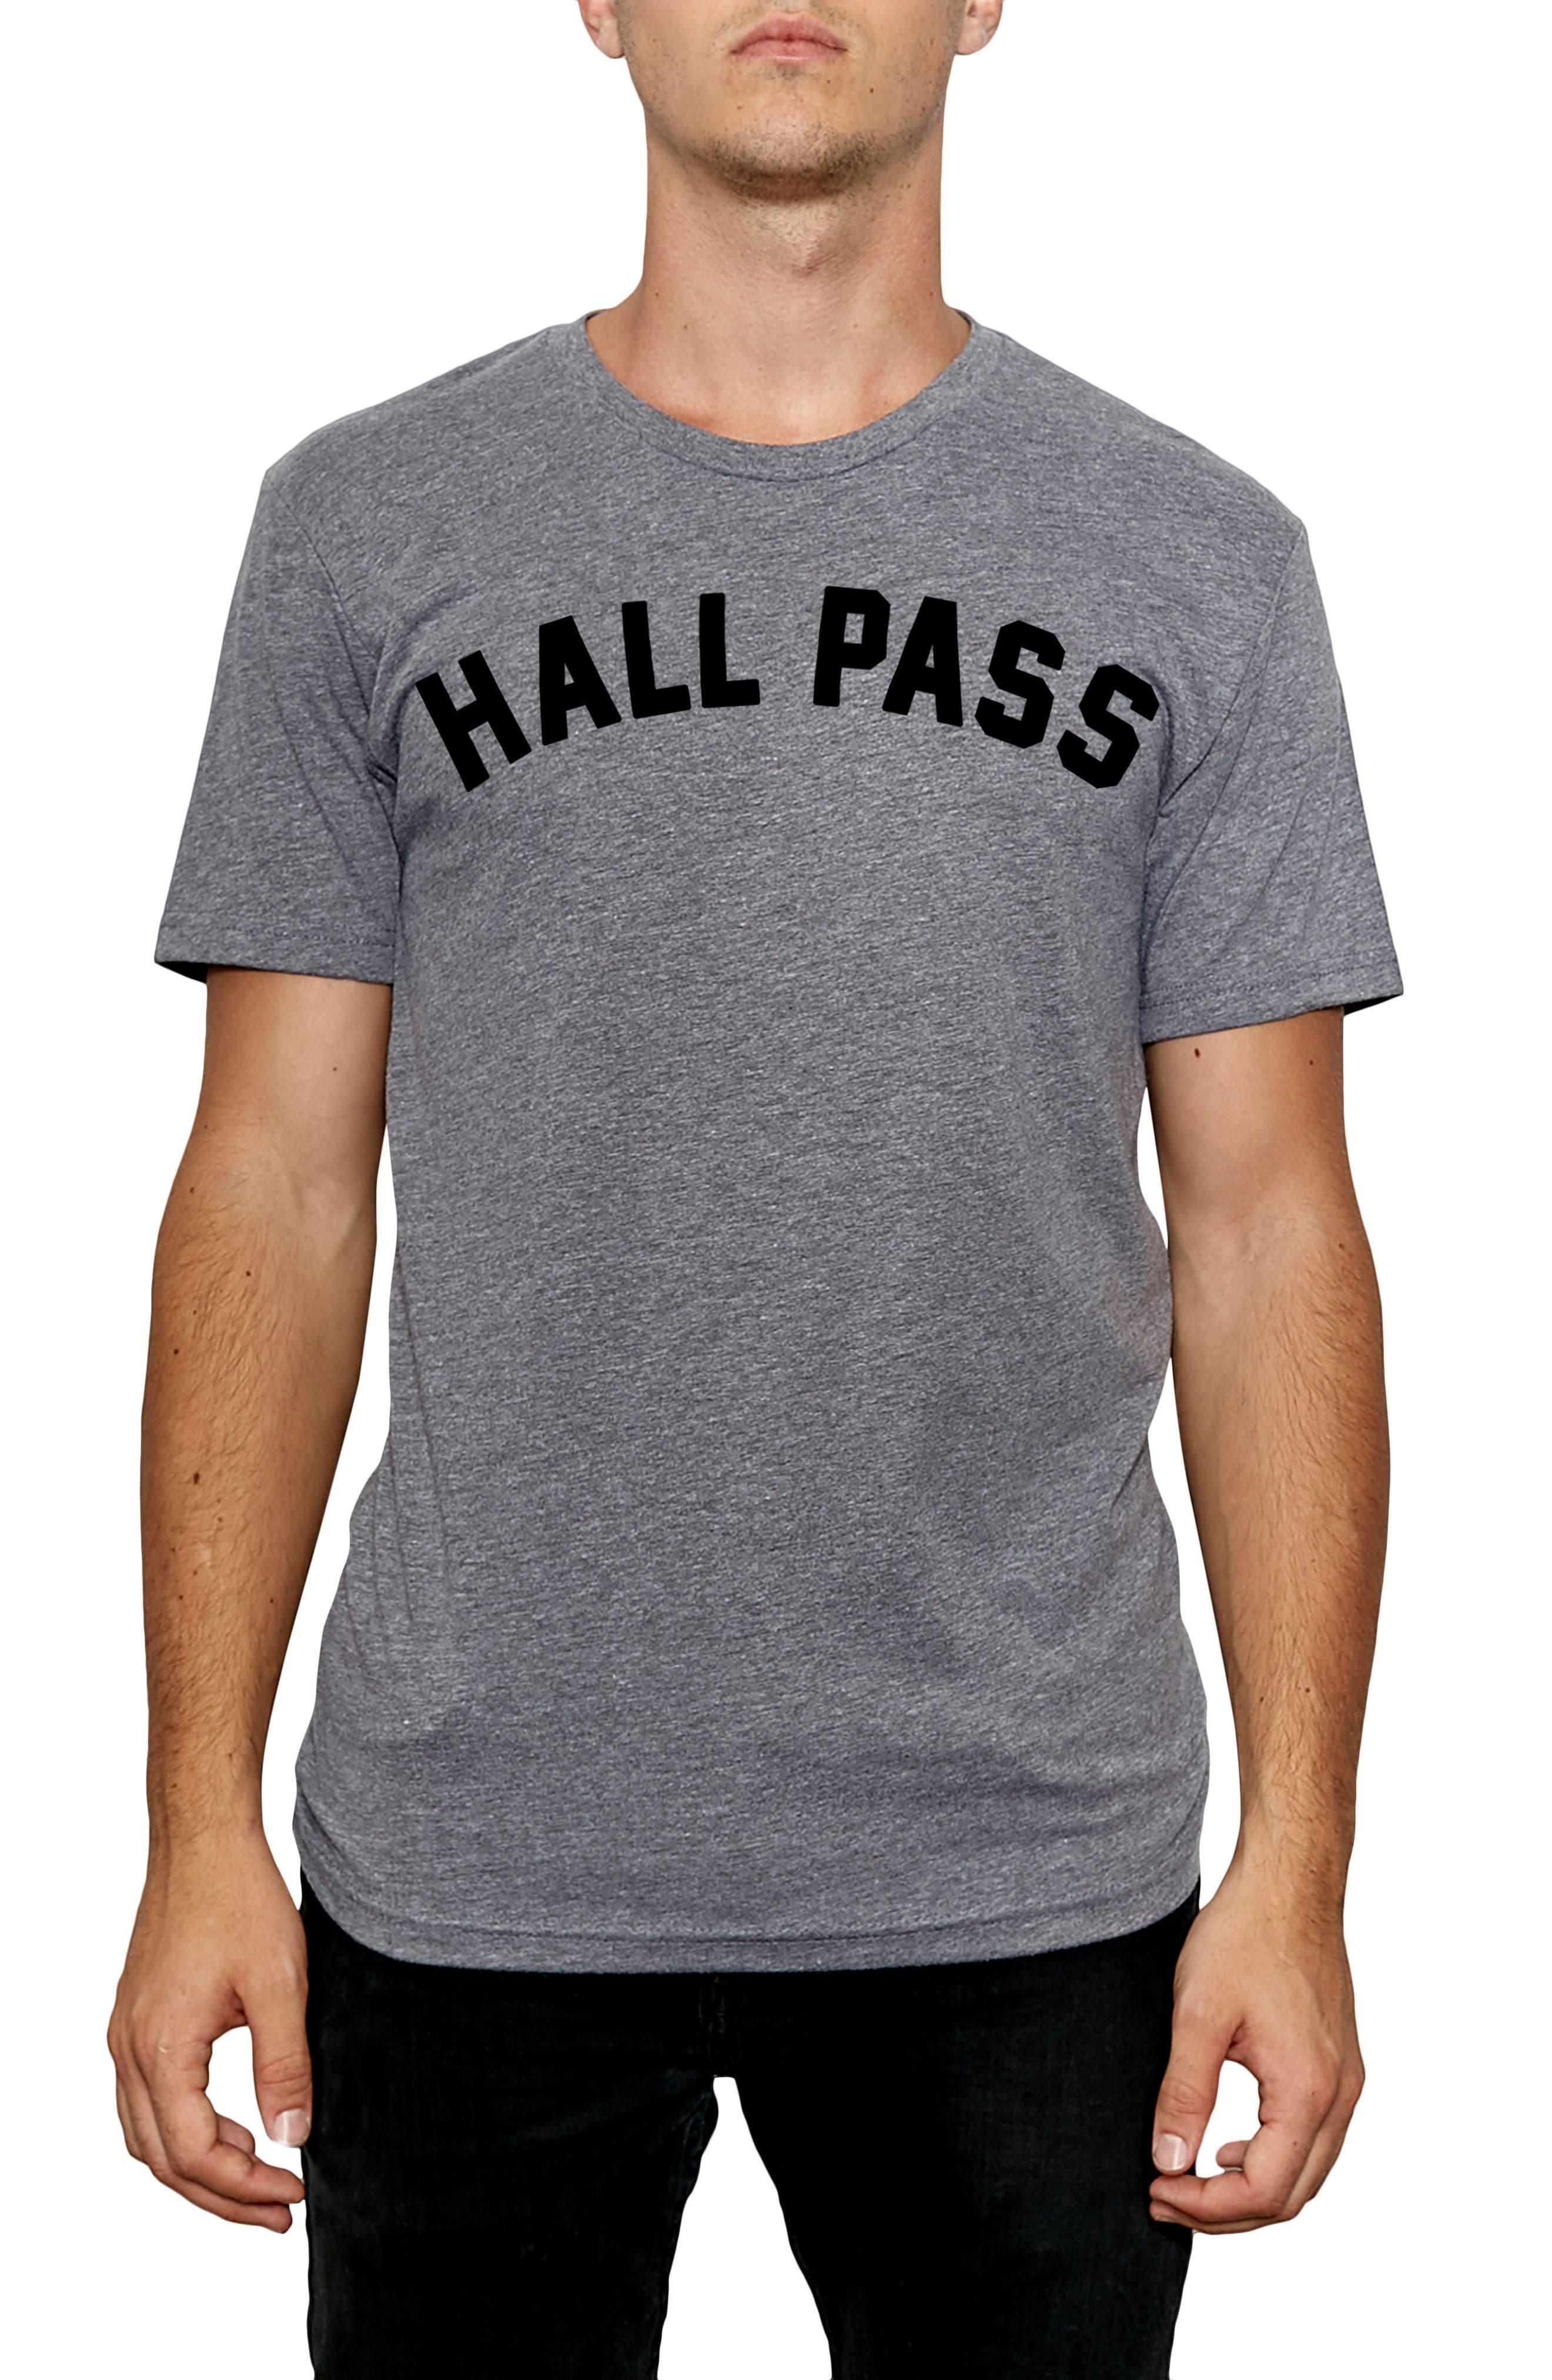 Kid Dangerous Hall Pass T-Shirt